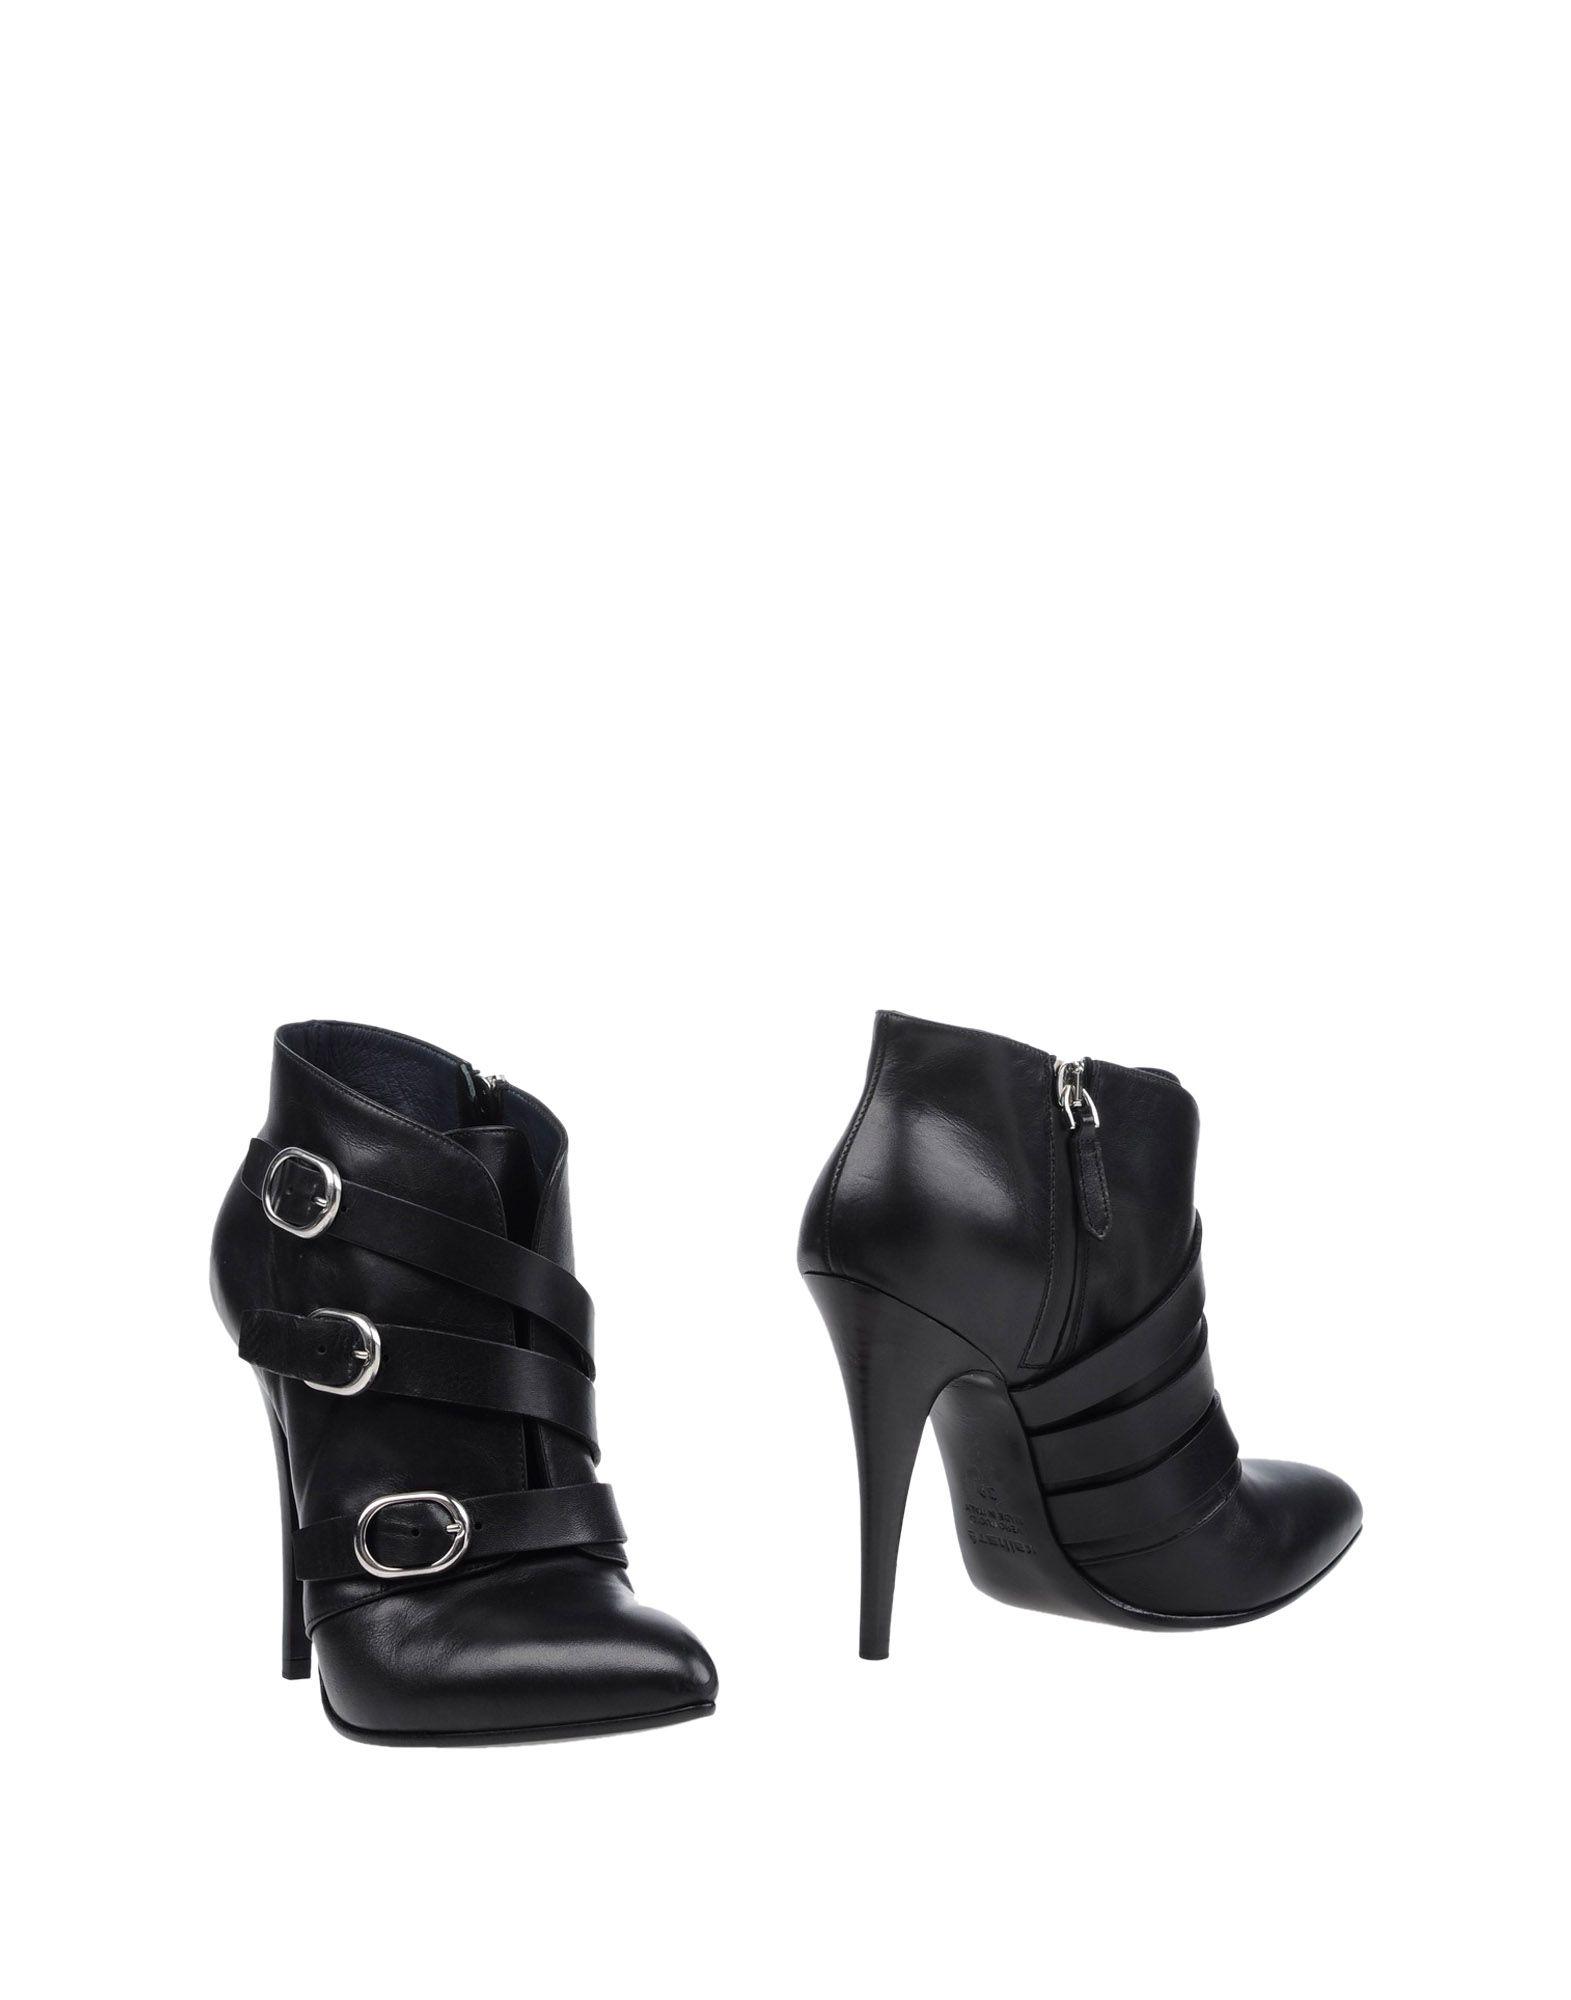 KALLISTÈ Полусапоги и высокие ботинки цены онлайн